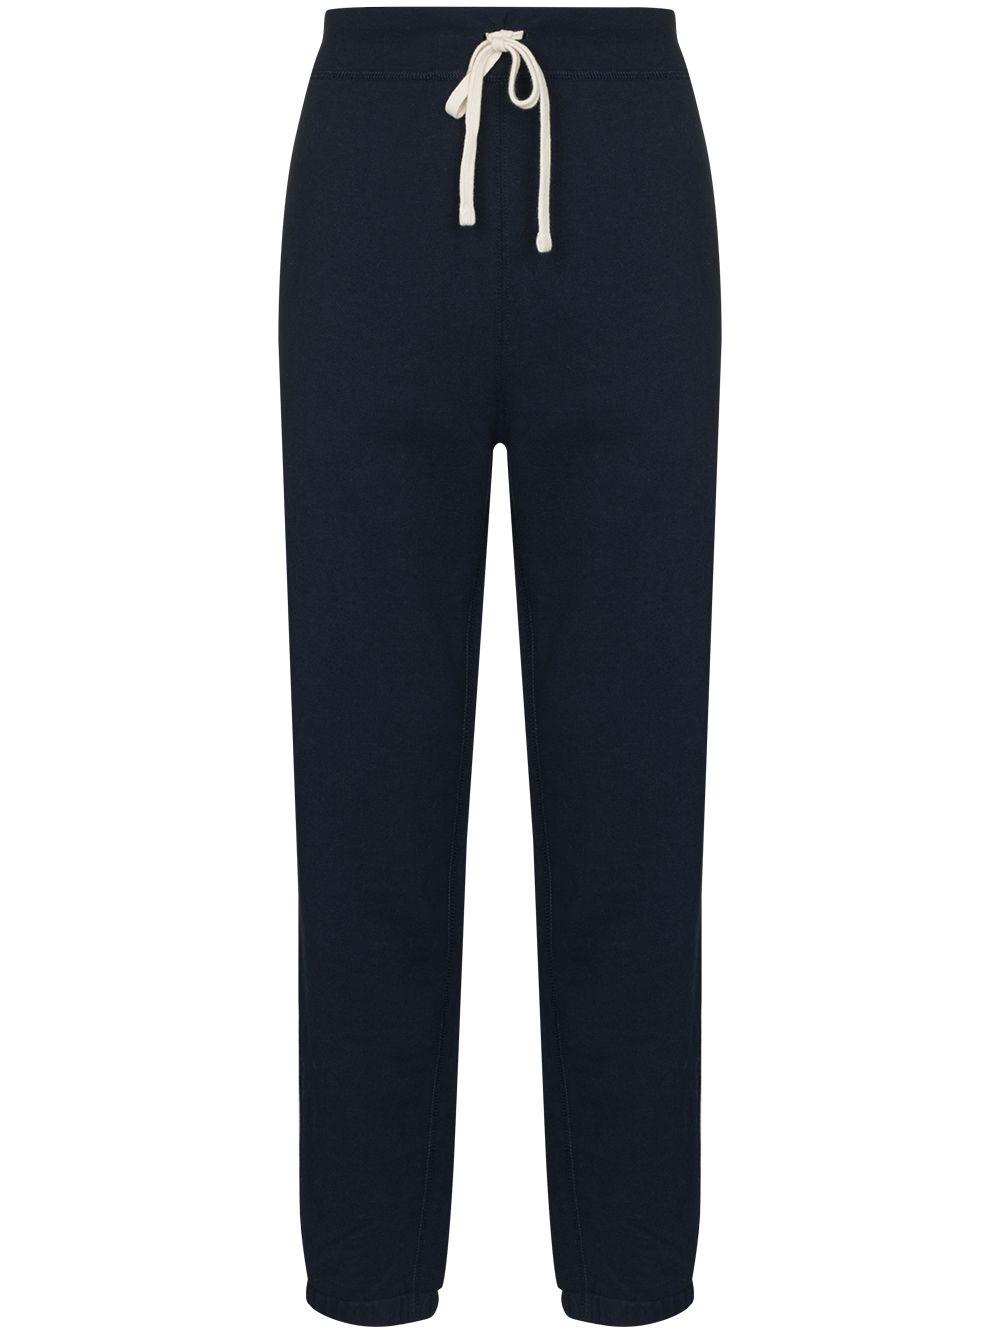 Polo Ralph Lauren drawstring waist track pants - Blau